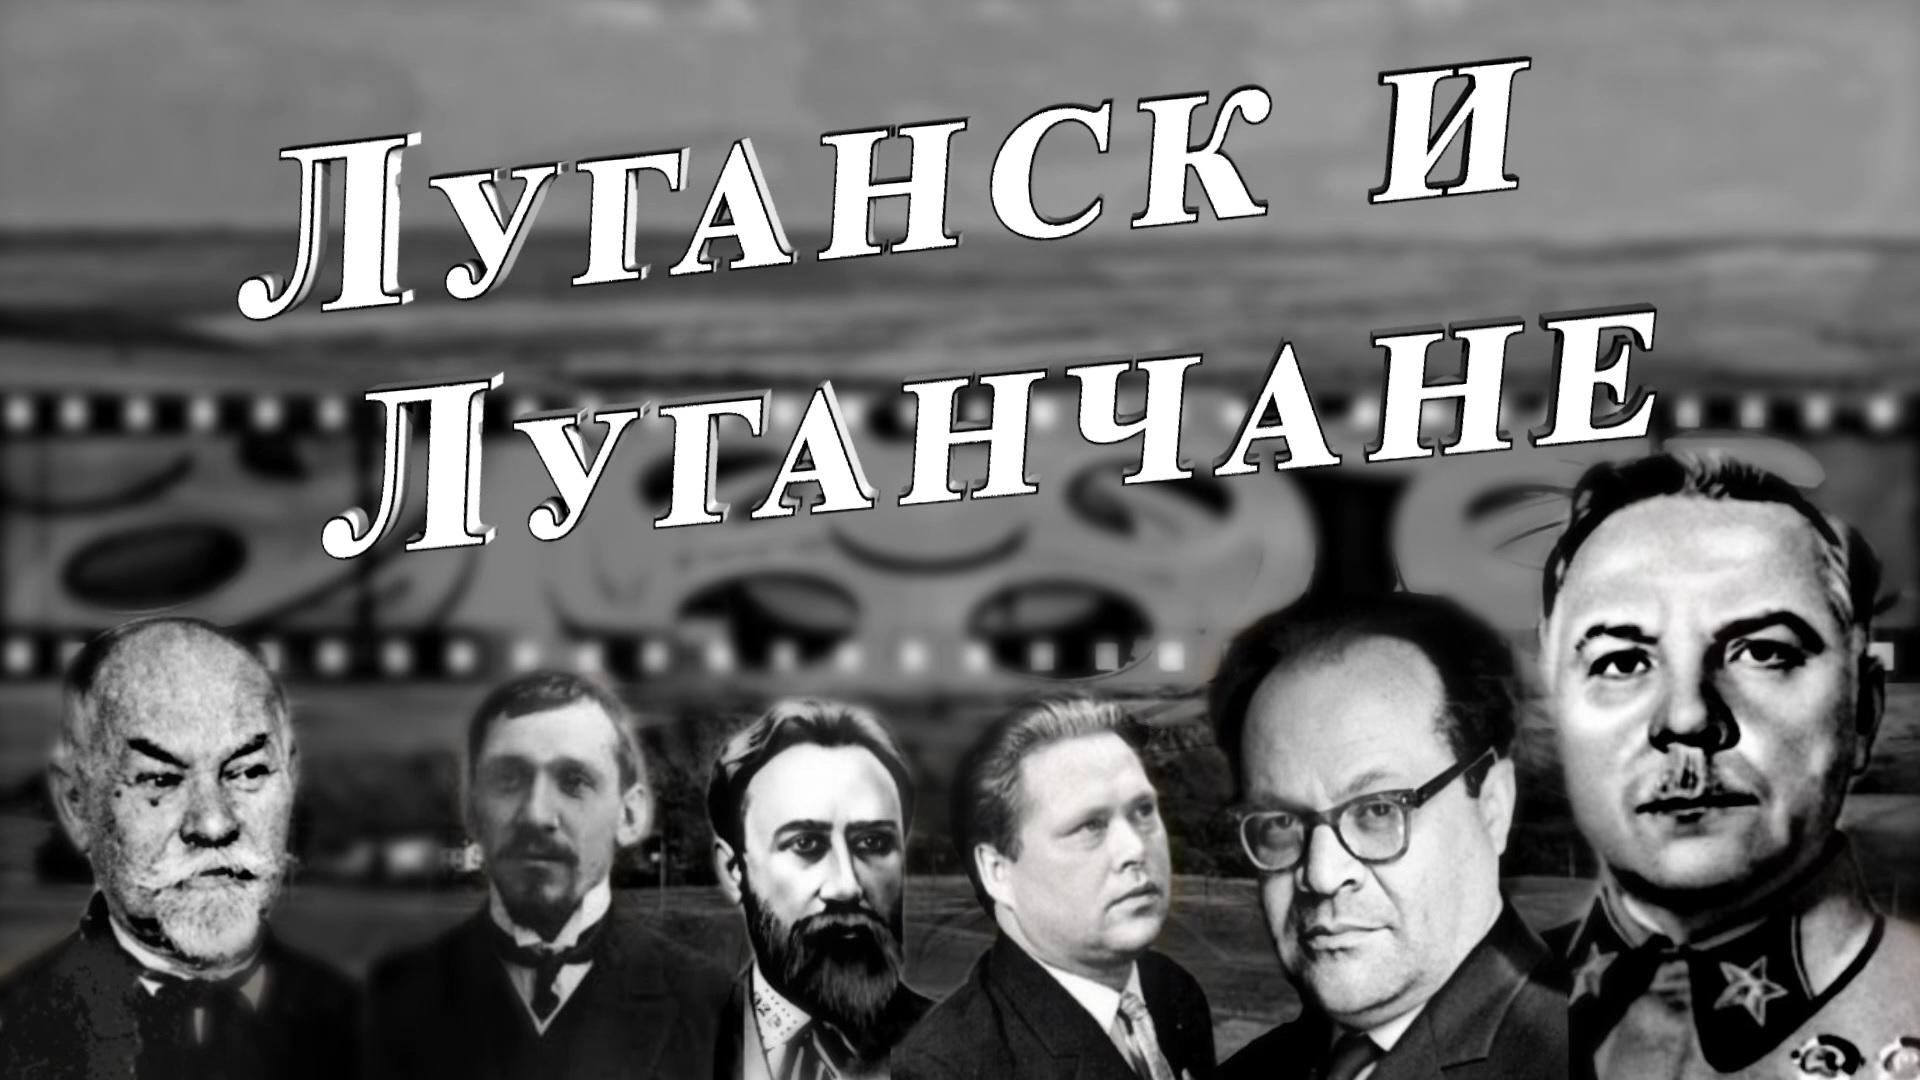 Луганск и Луганчане